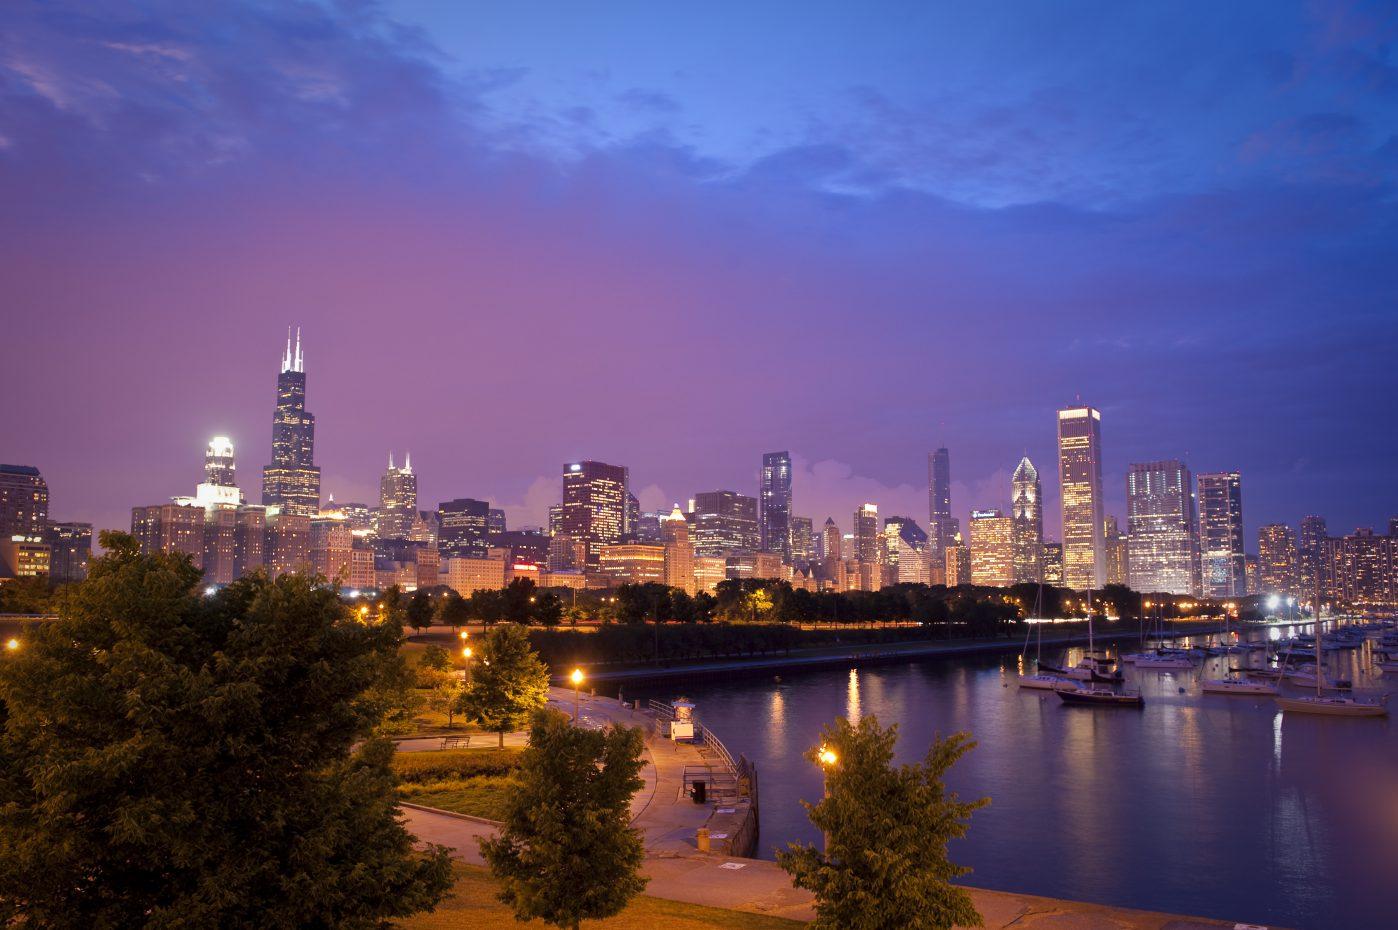 CITY_Chicago_CityLights_Harbor